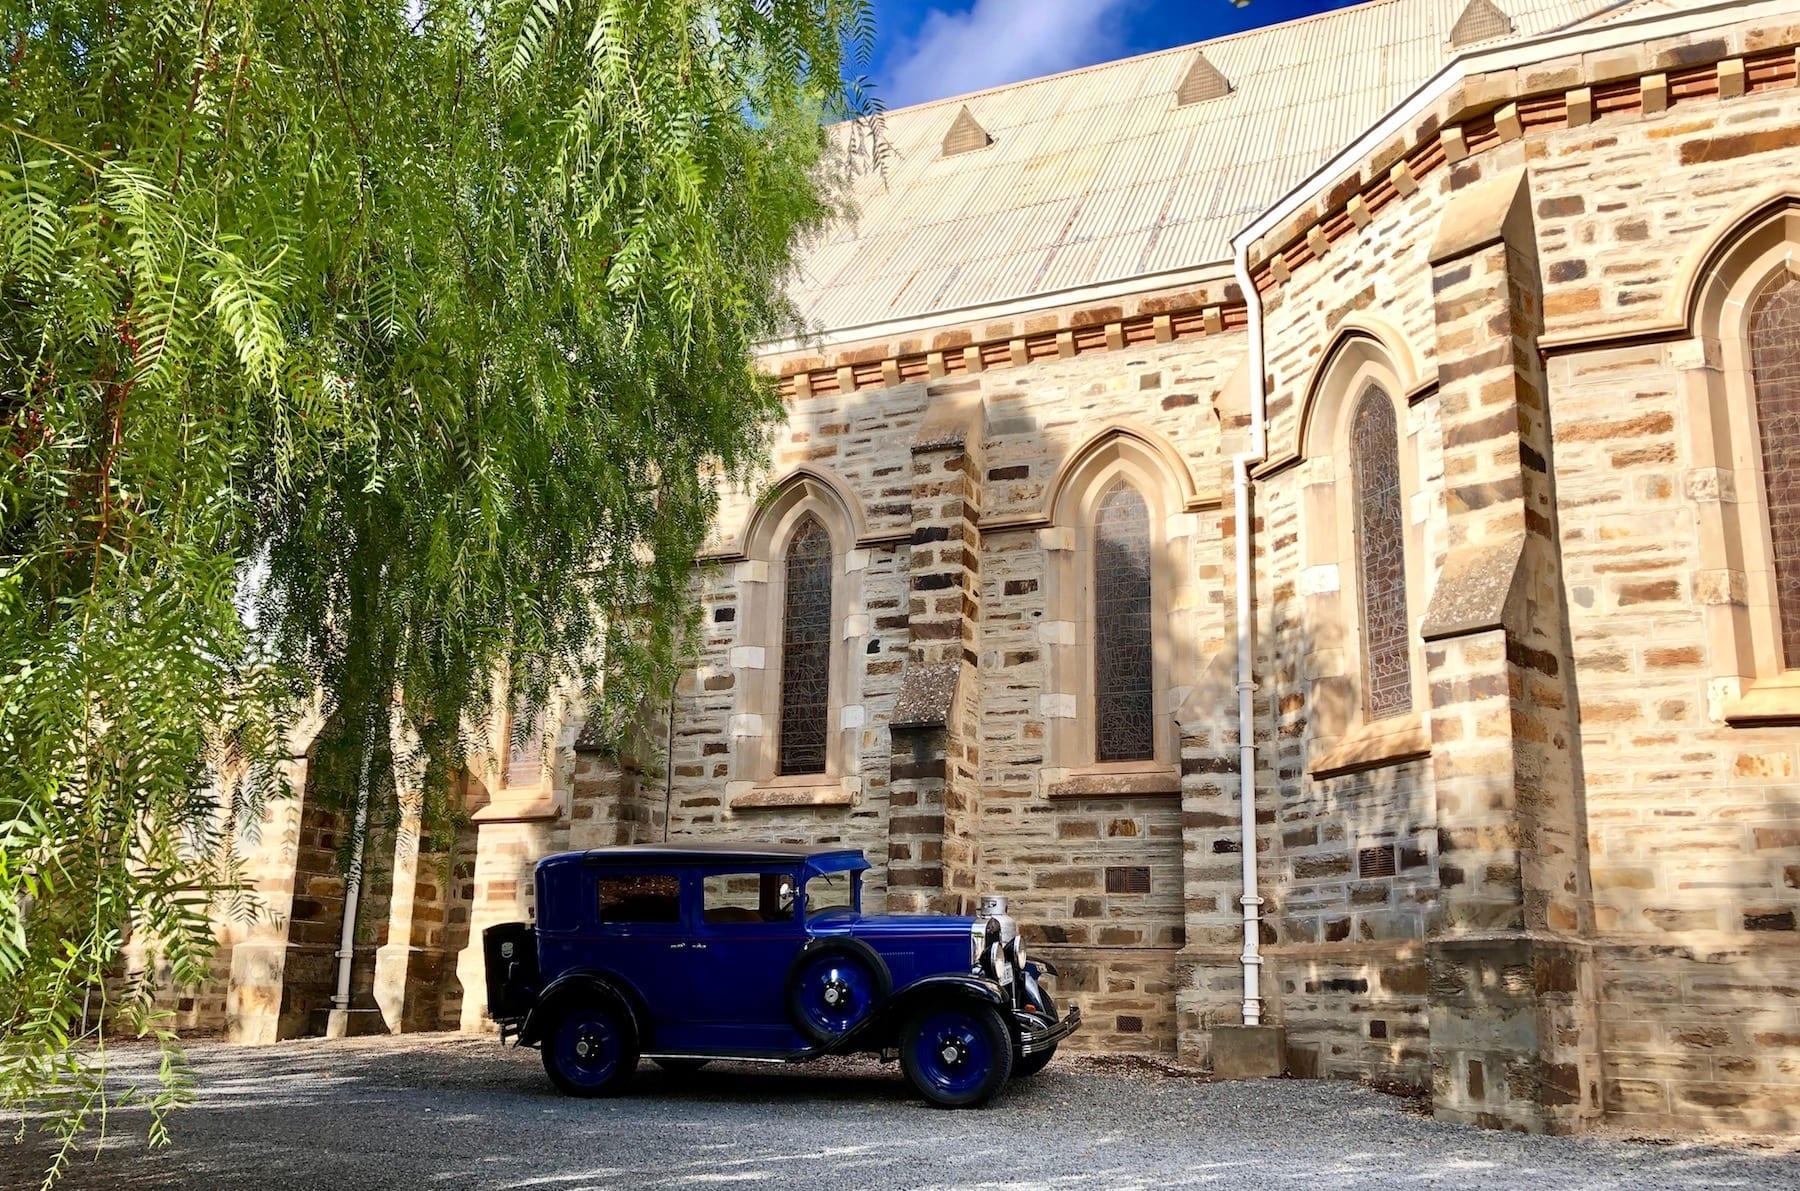 A vintage car outside the catholic church in Burra South Australia.